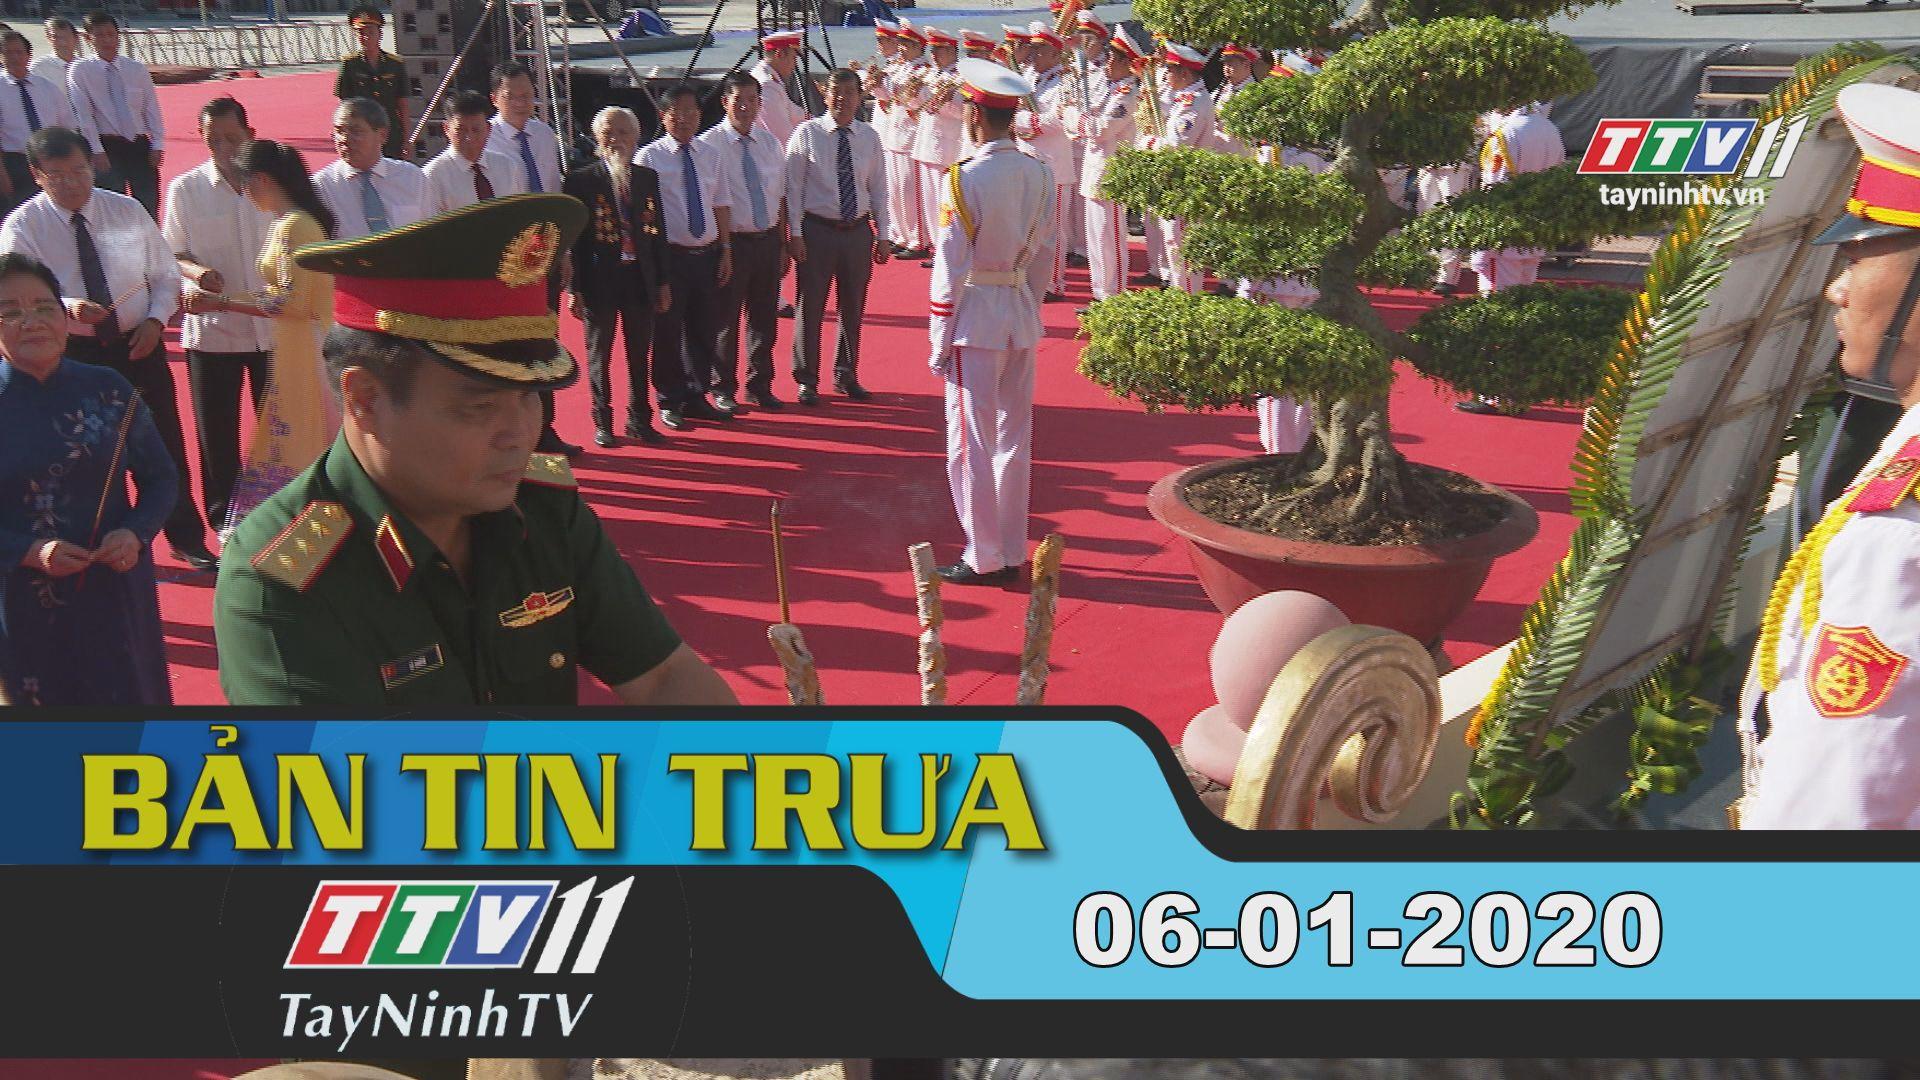 Bản tin trưa 06-01-2020 | Tin tức hôm nay | TayNinhTV